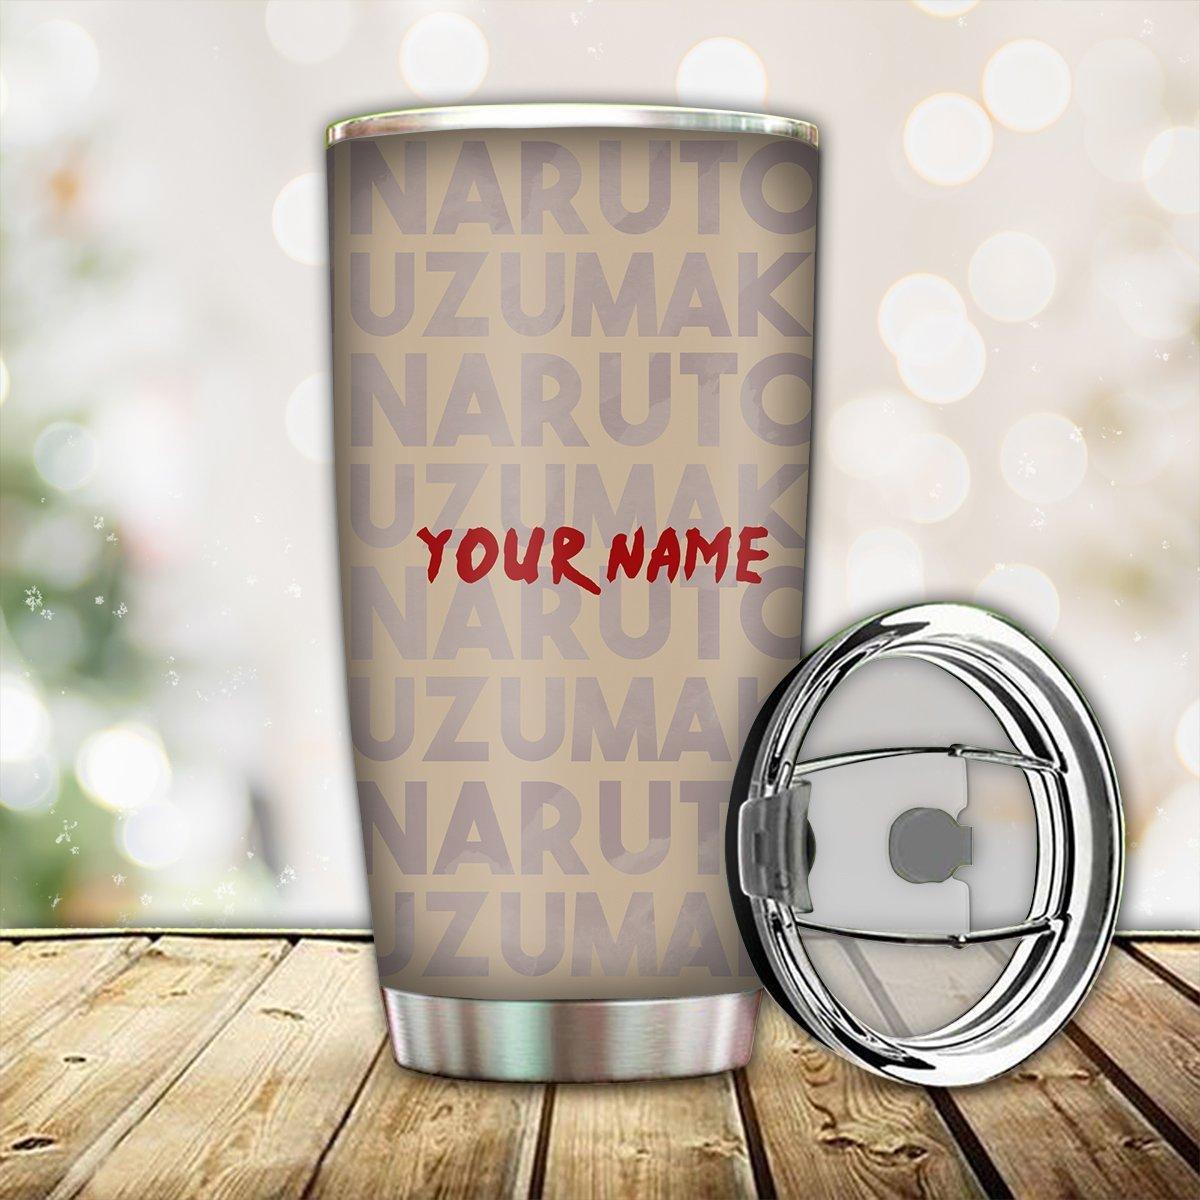 personalized chibi naruto tumbler 140823 - Otaku Treat